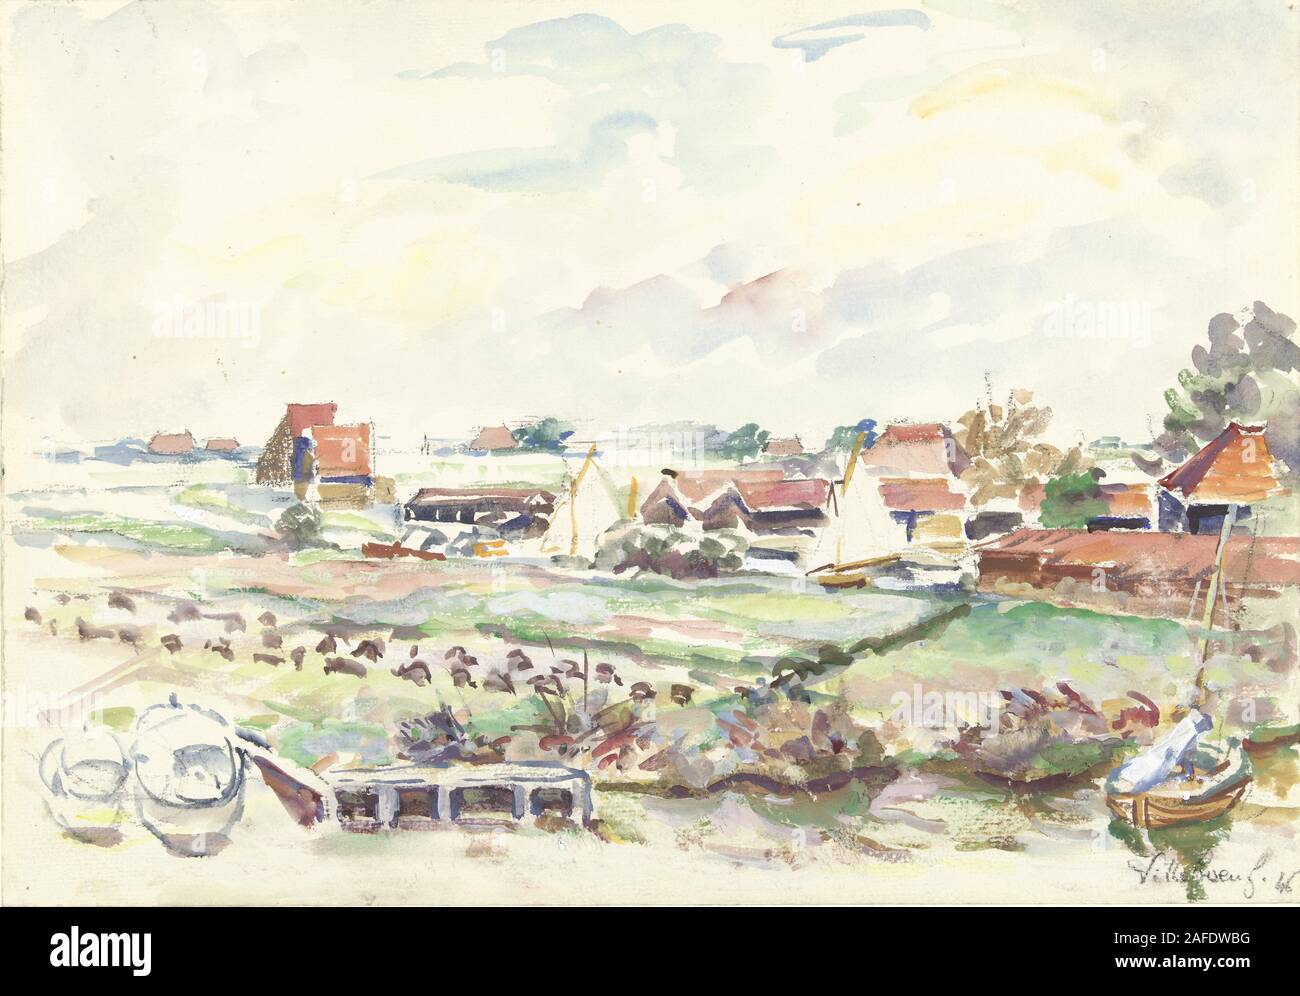 Landschaft in Friesland, Villeboeuf, 1846.jpg - 2 AFDWBG Stockfoto